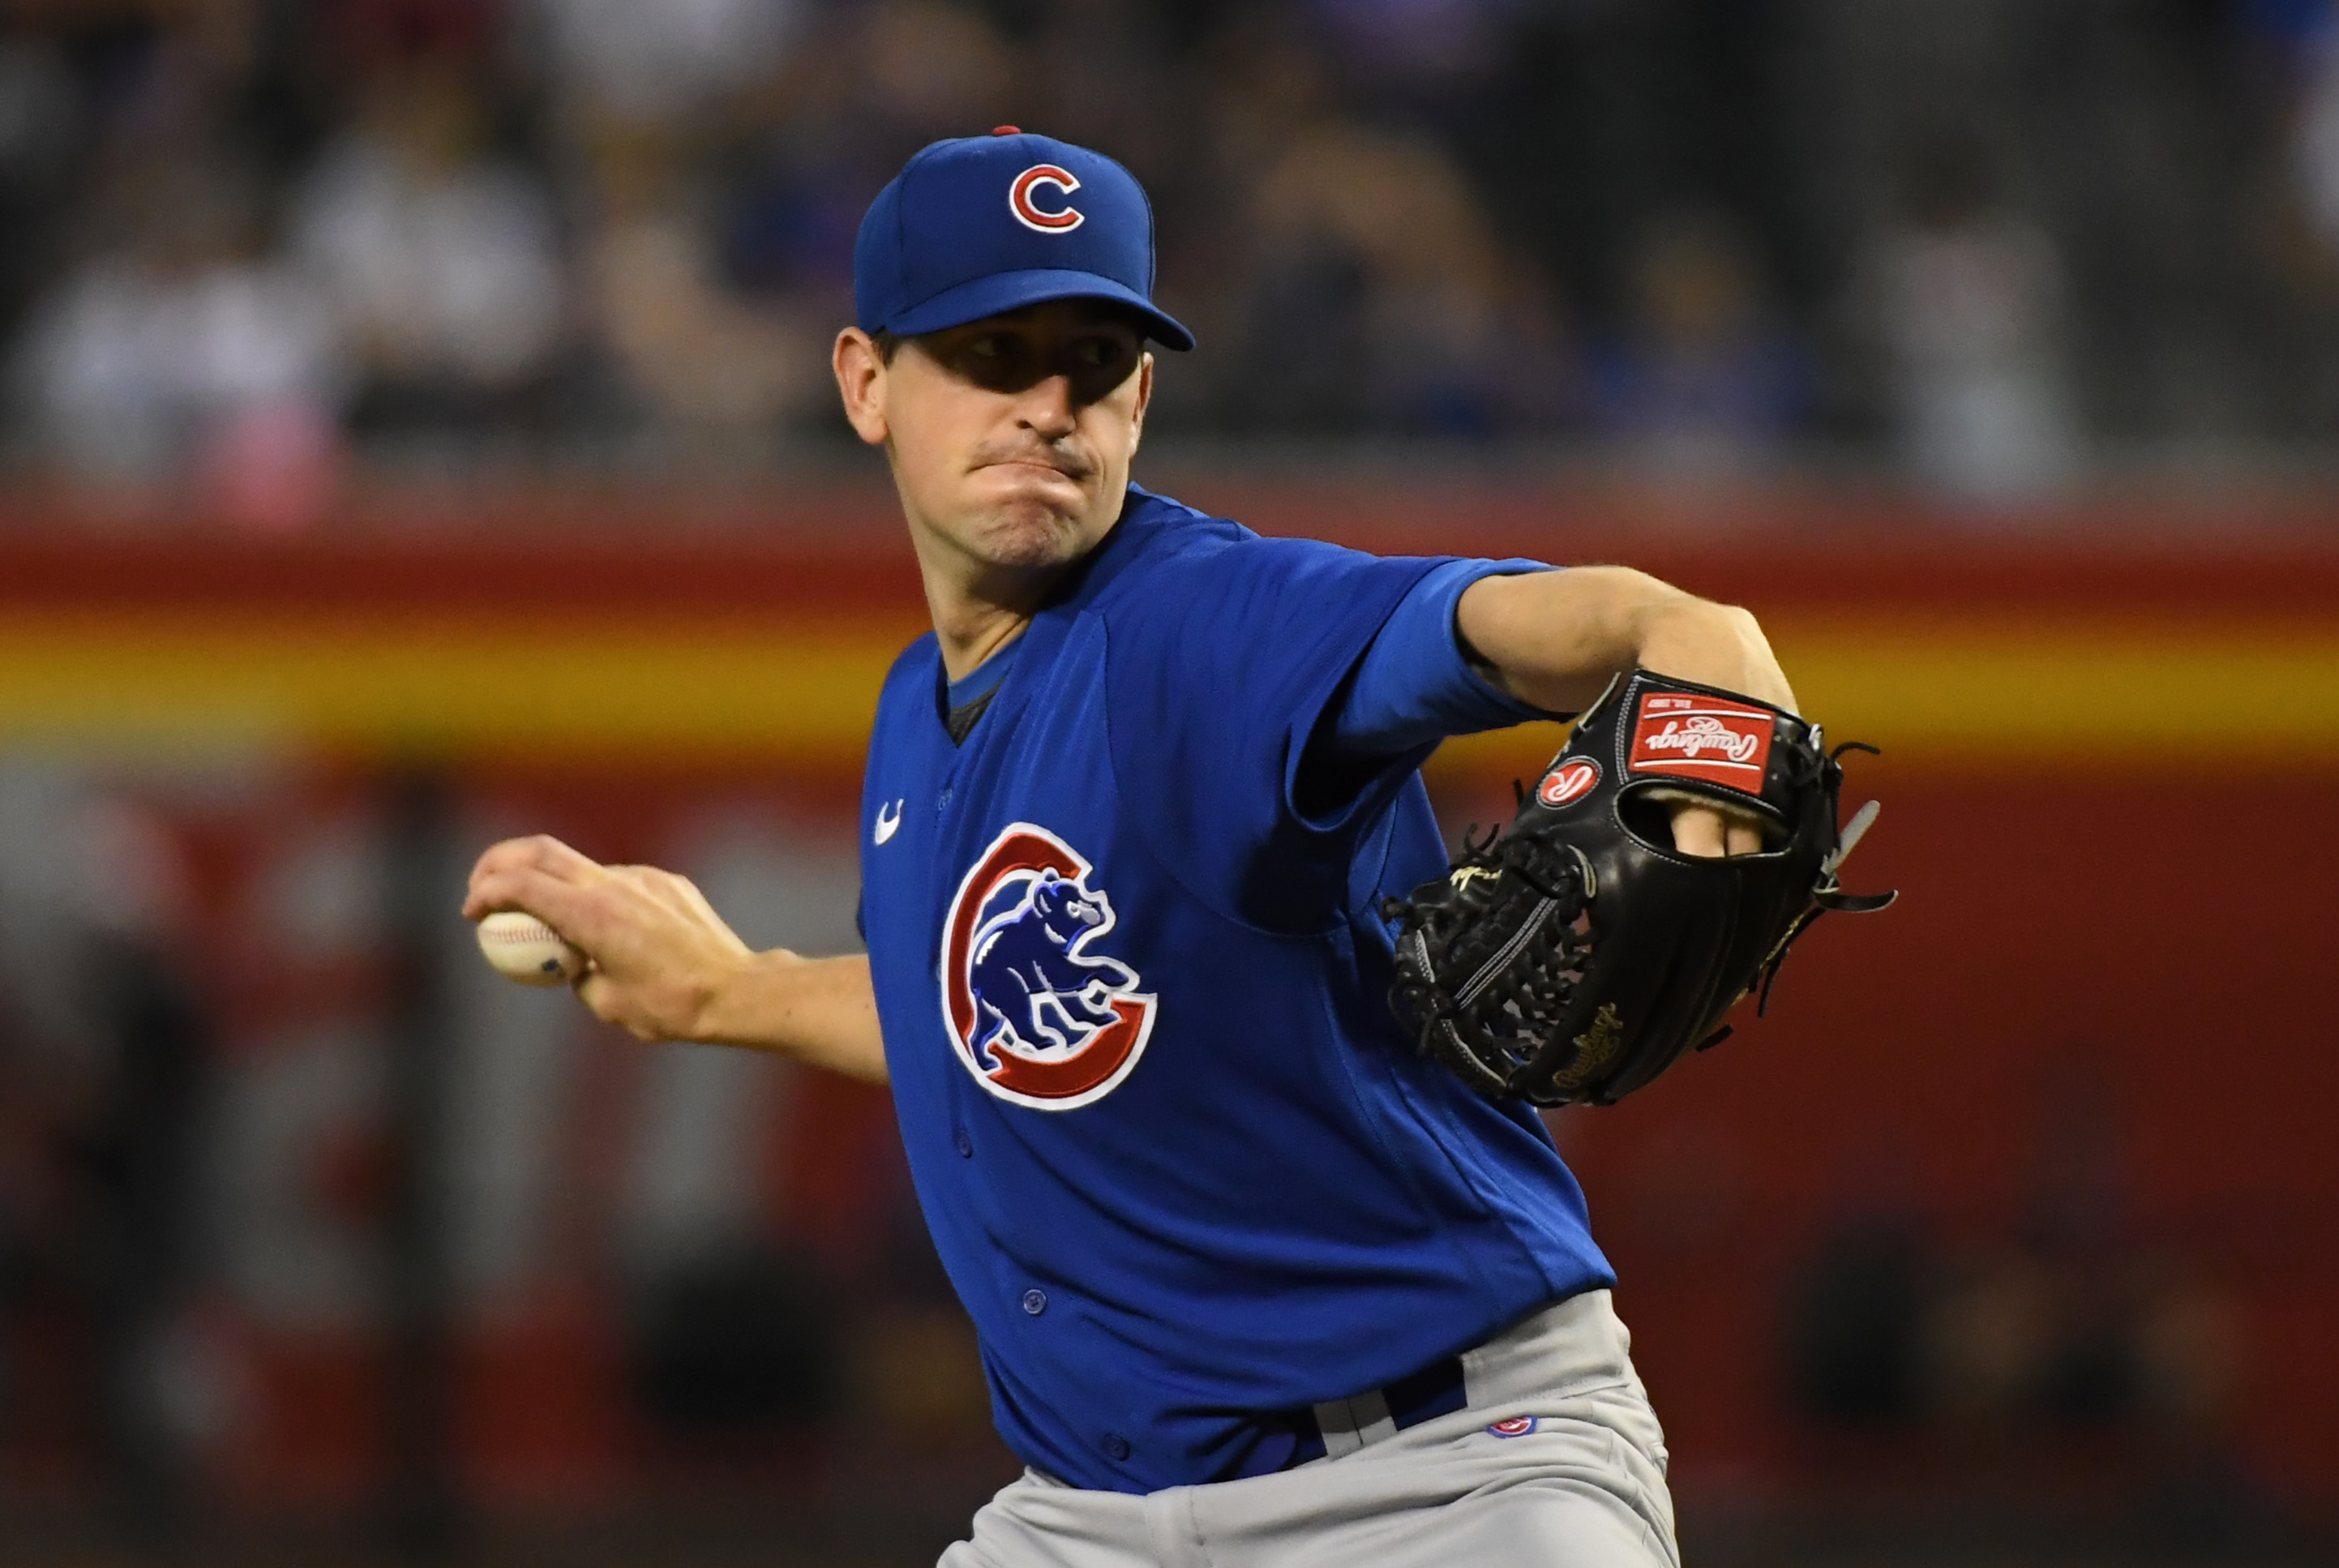 Cubs Trade Rumors: Kyle Hendricks 'Definitely Not Being Shopped' Ahead of Deadline